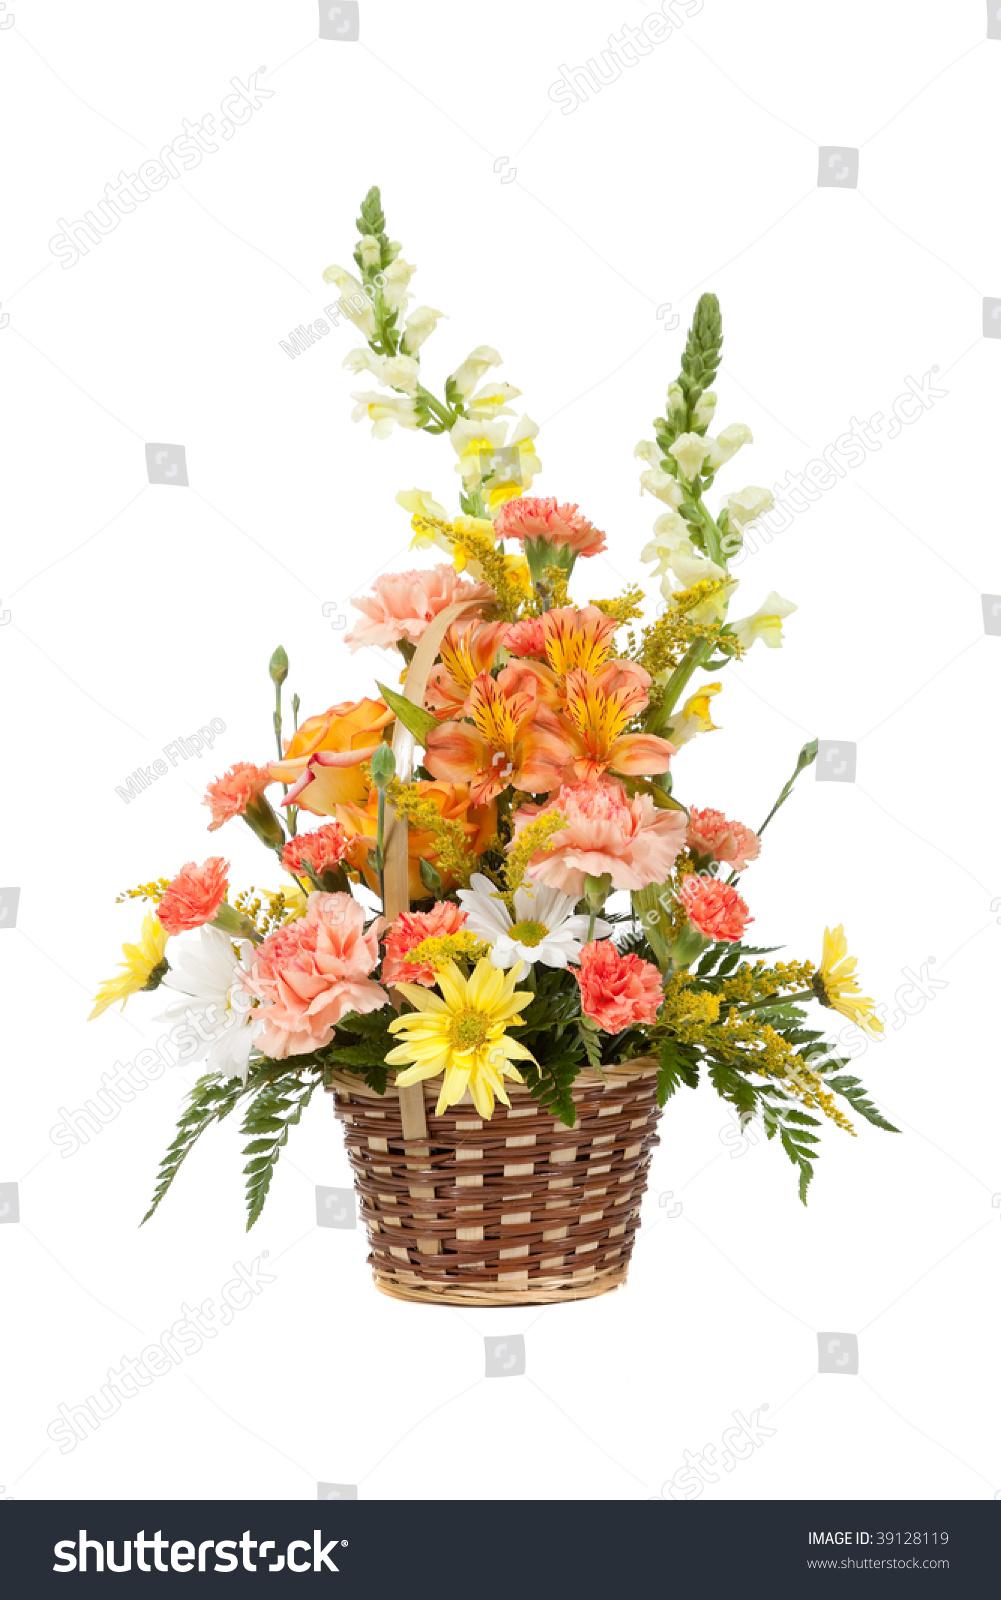 Flower arrangement including carnations irises daisy stock photo flower arrangement including carnations irises daisy greenery in a wicker basket on a white background izmirmasajfo